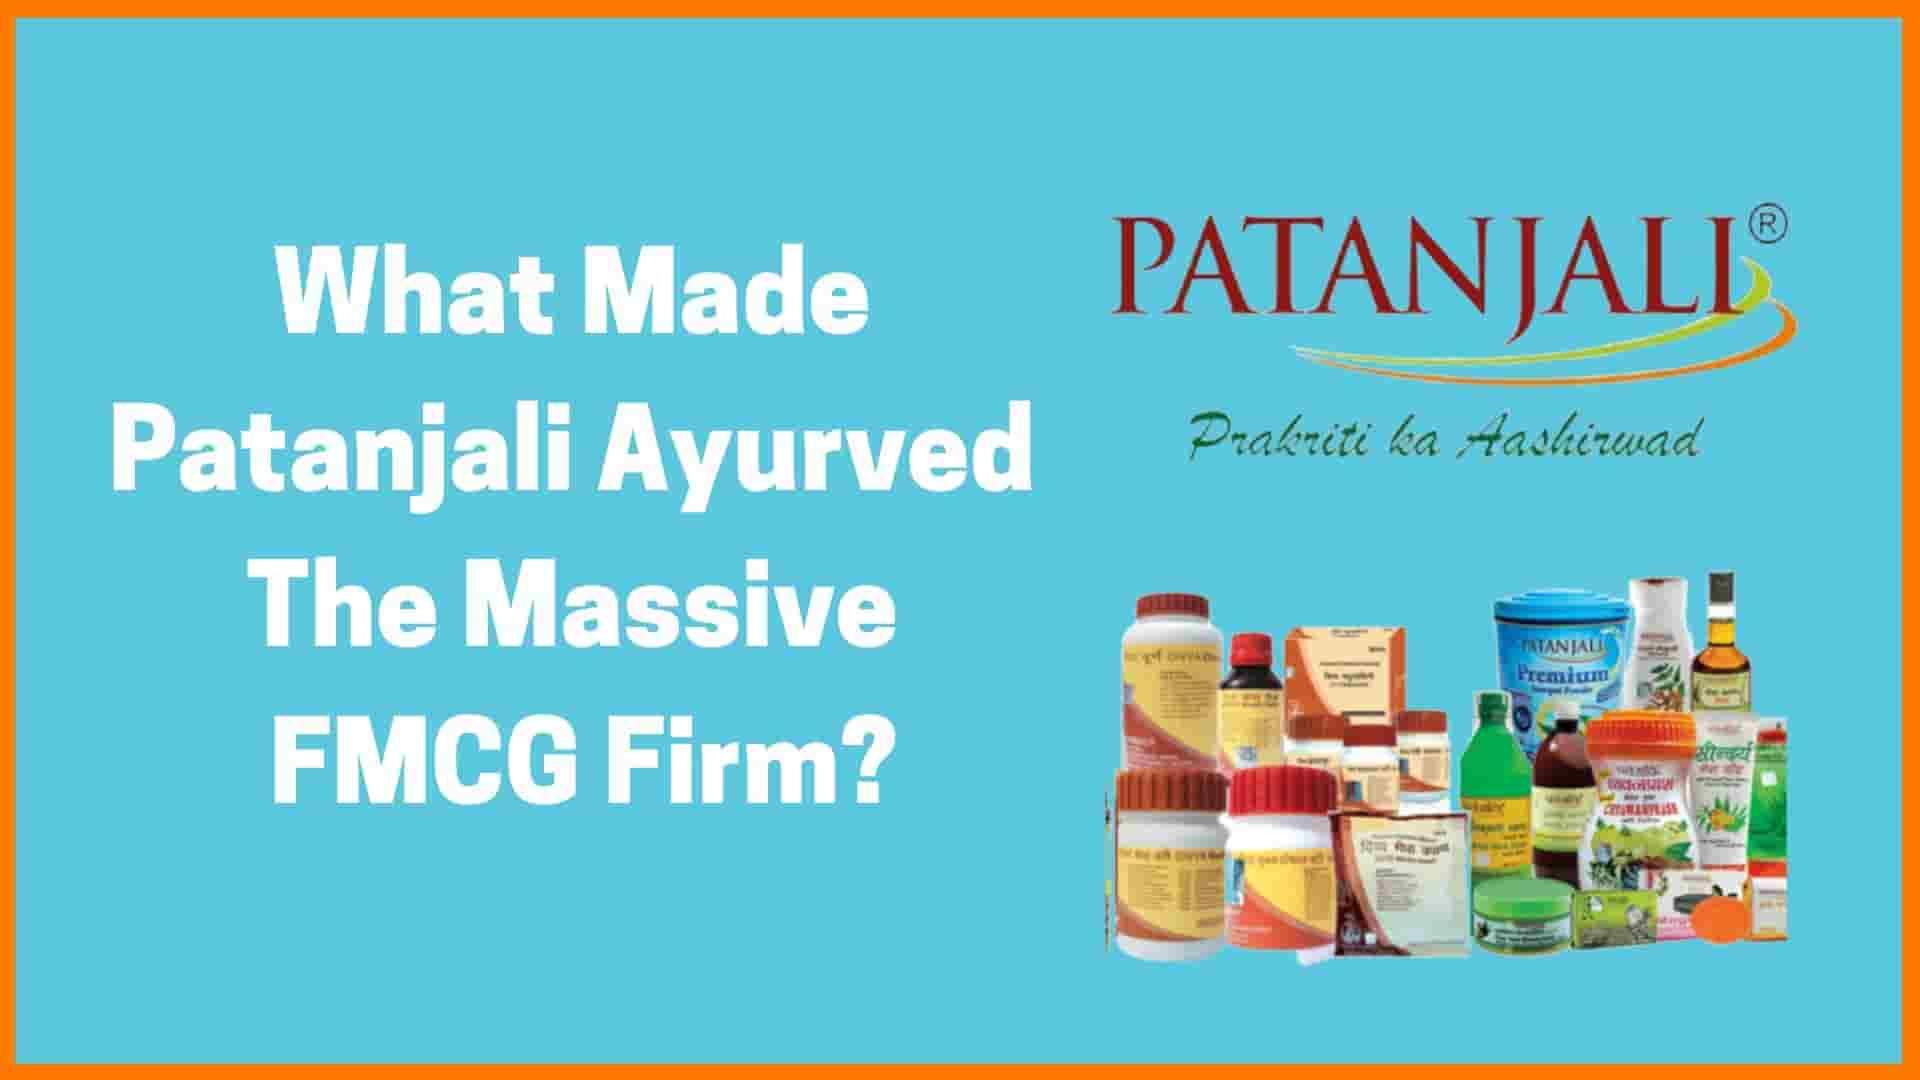 Patanjali Ayurved Success Story - Patanjali Case Study